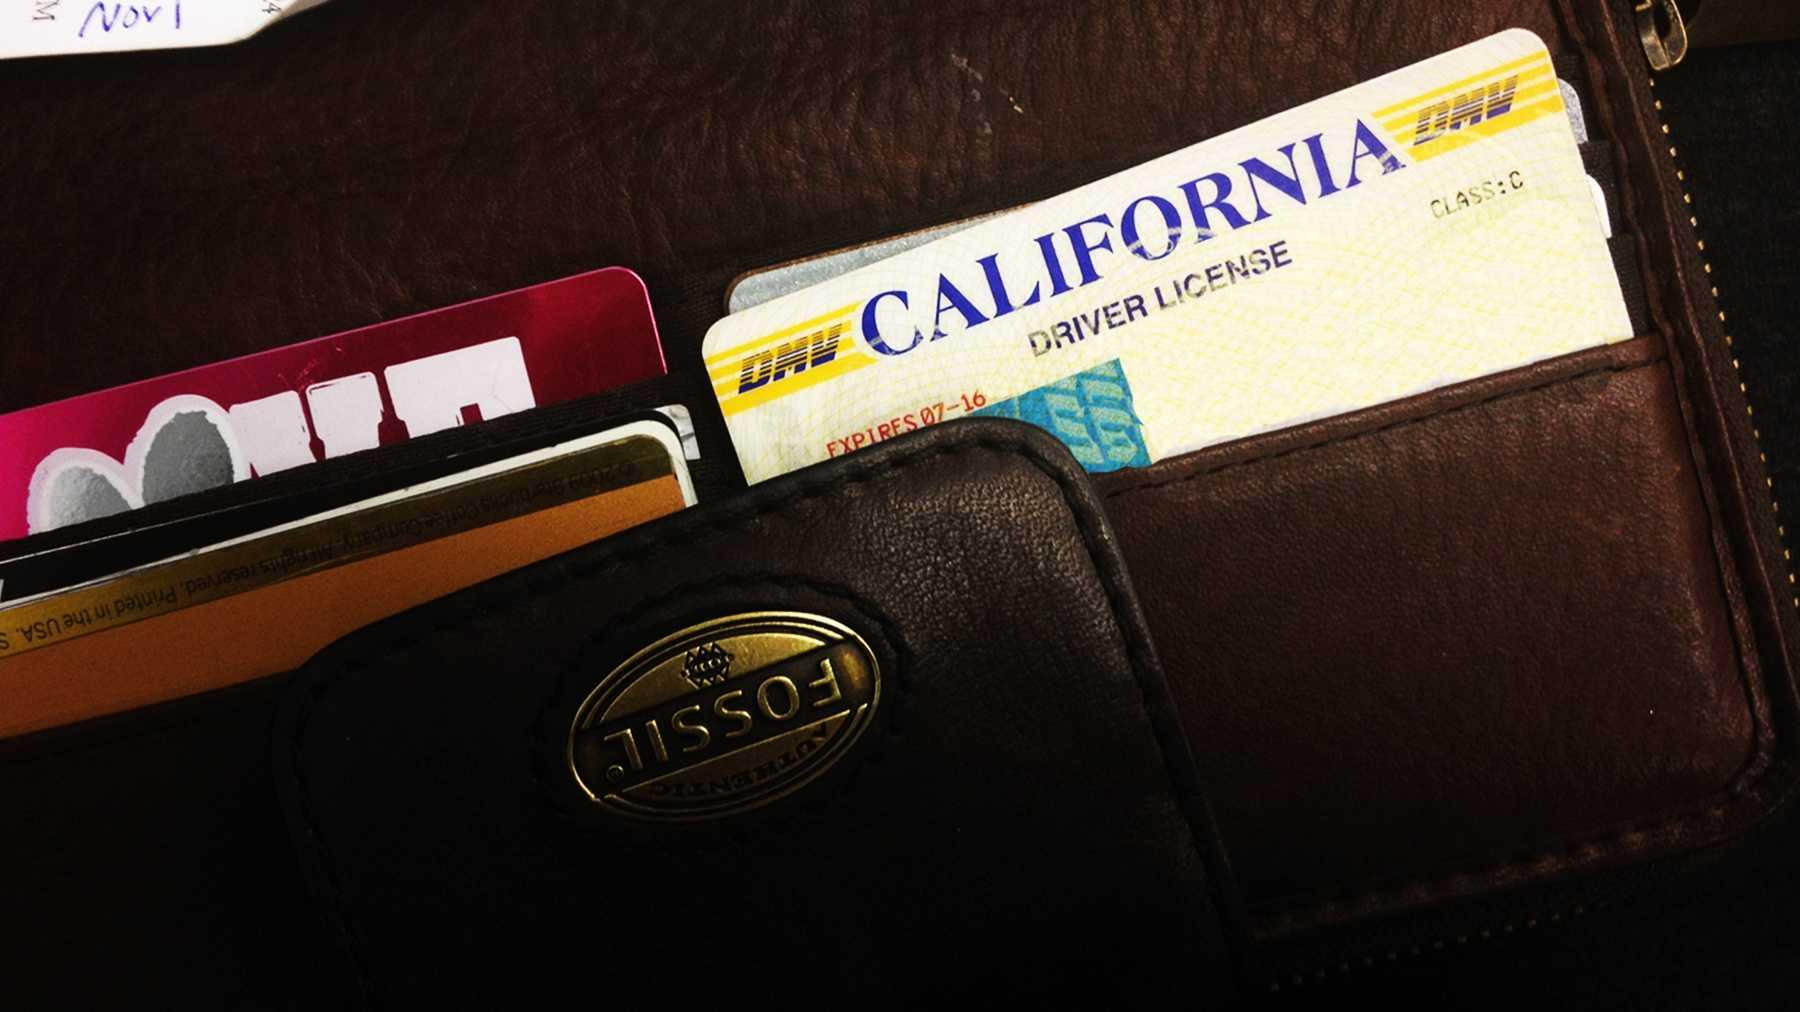 california drivers license.jpg